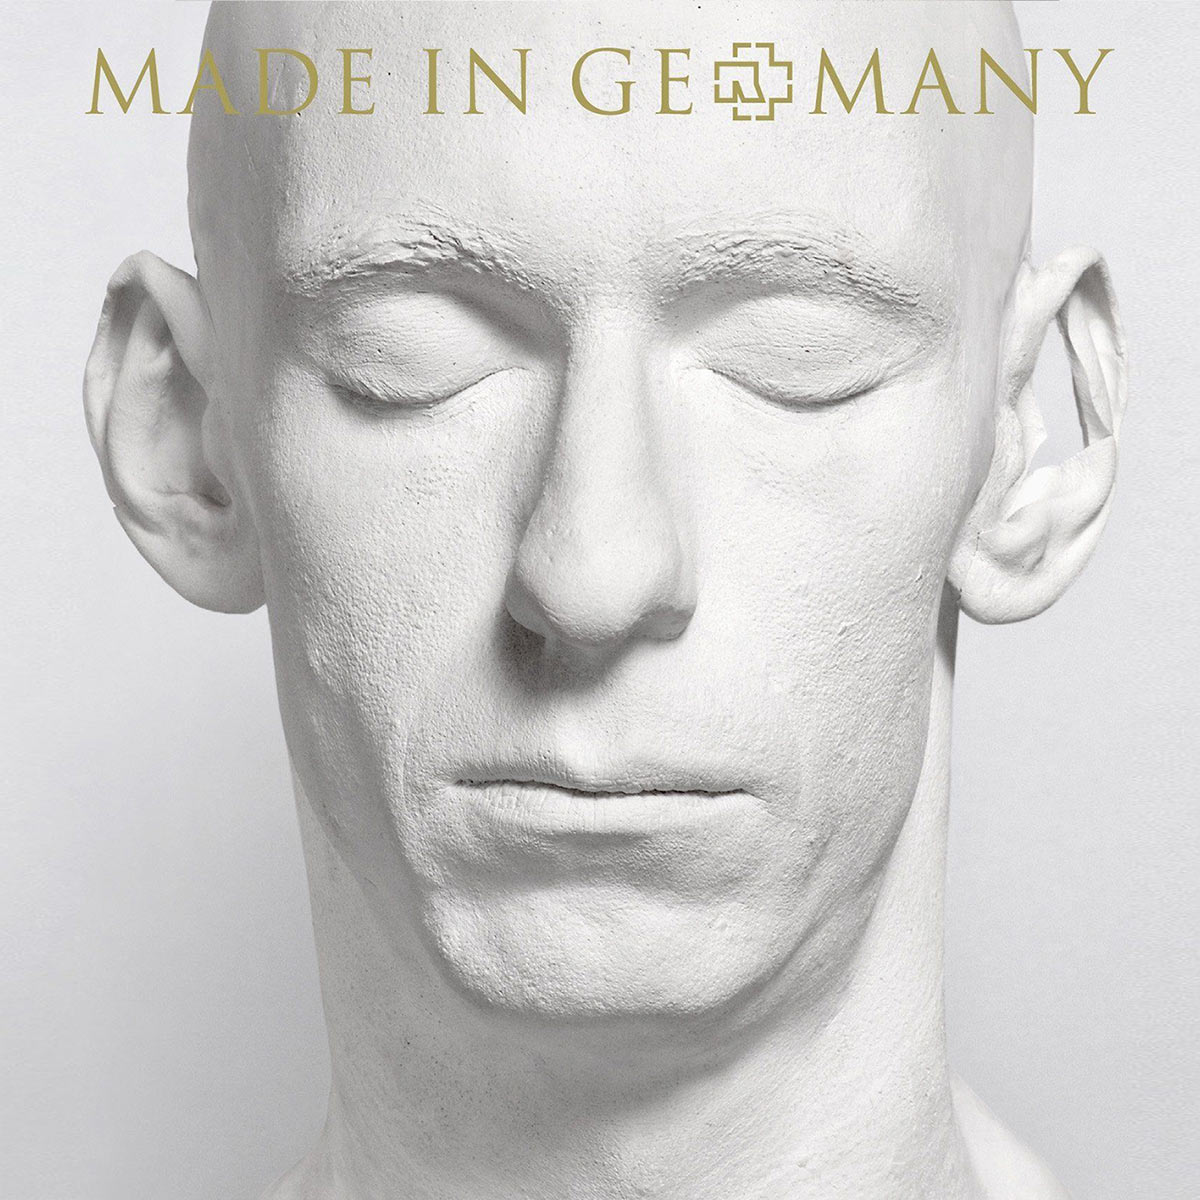 rammstein world album bestof made in germany 19952011